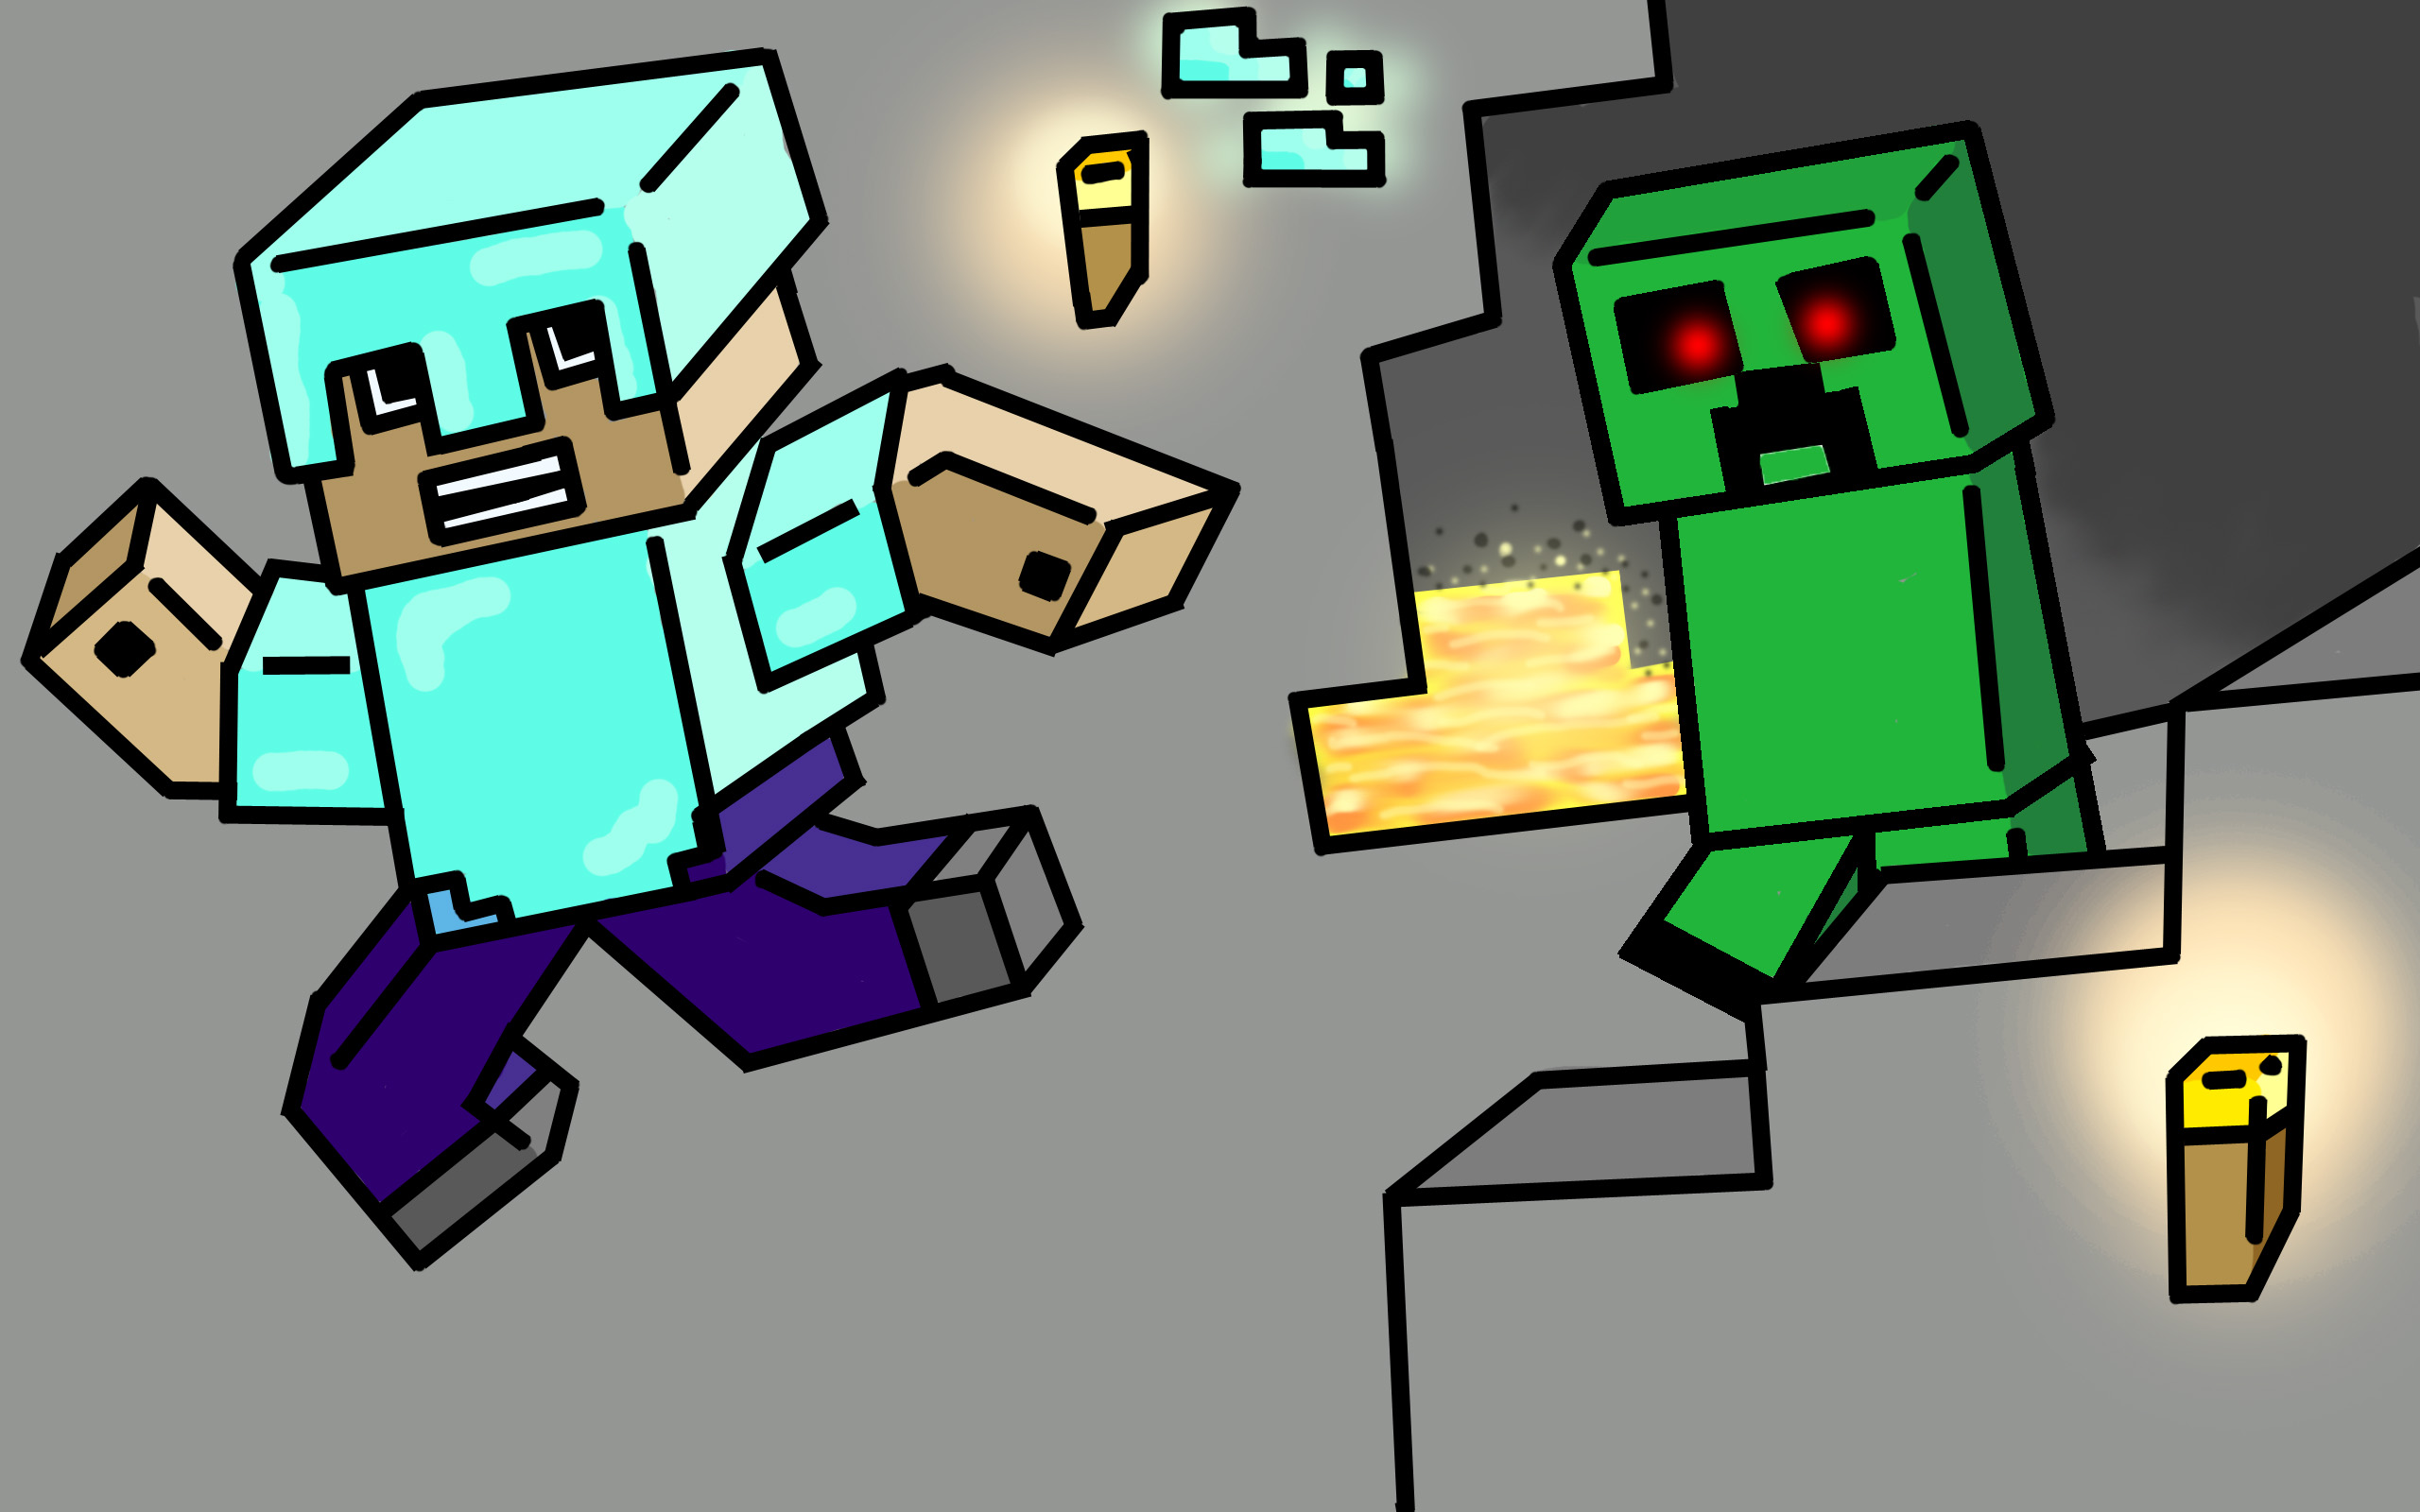 Skydoesminecraft Fan Art Tumblr Minecraft Captainsparklez Revenge Fan Art By Jadens Dad